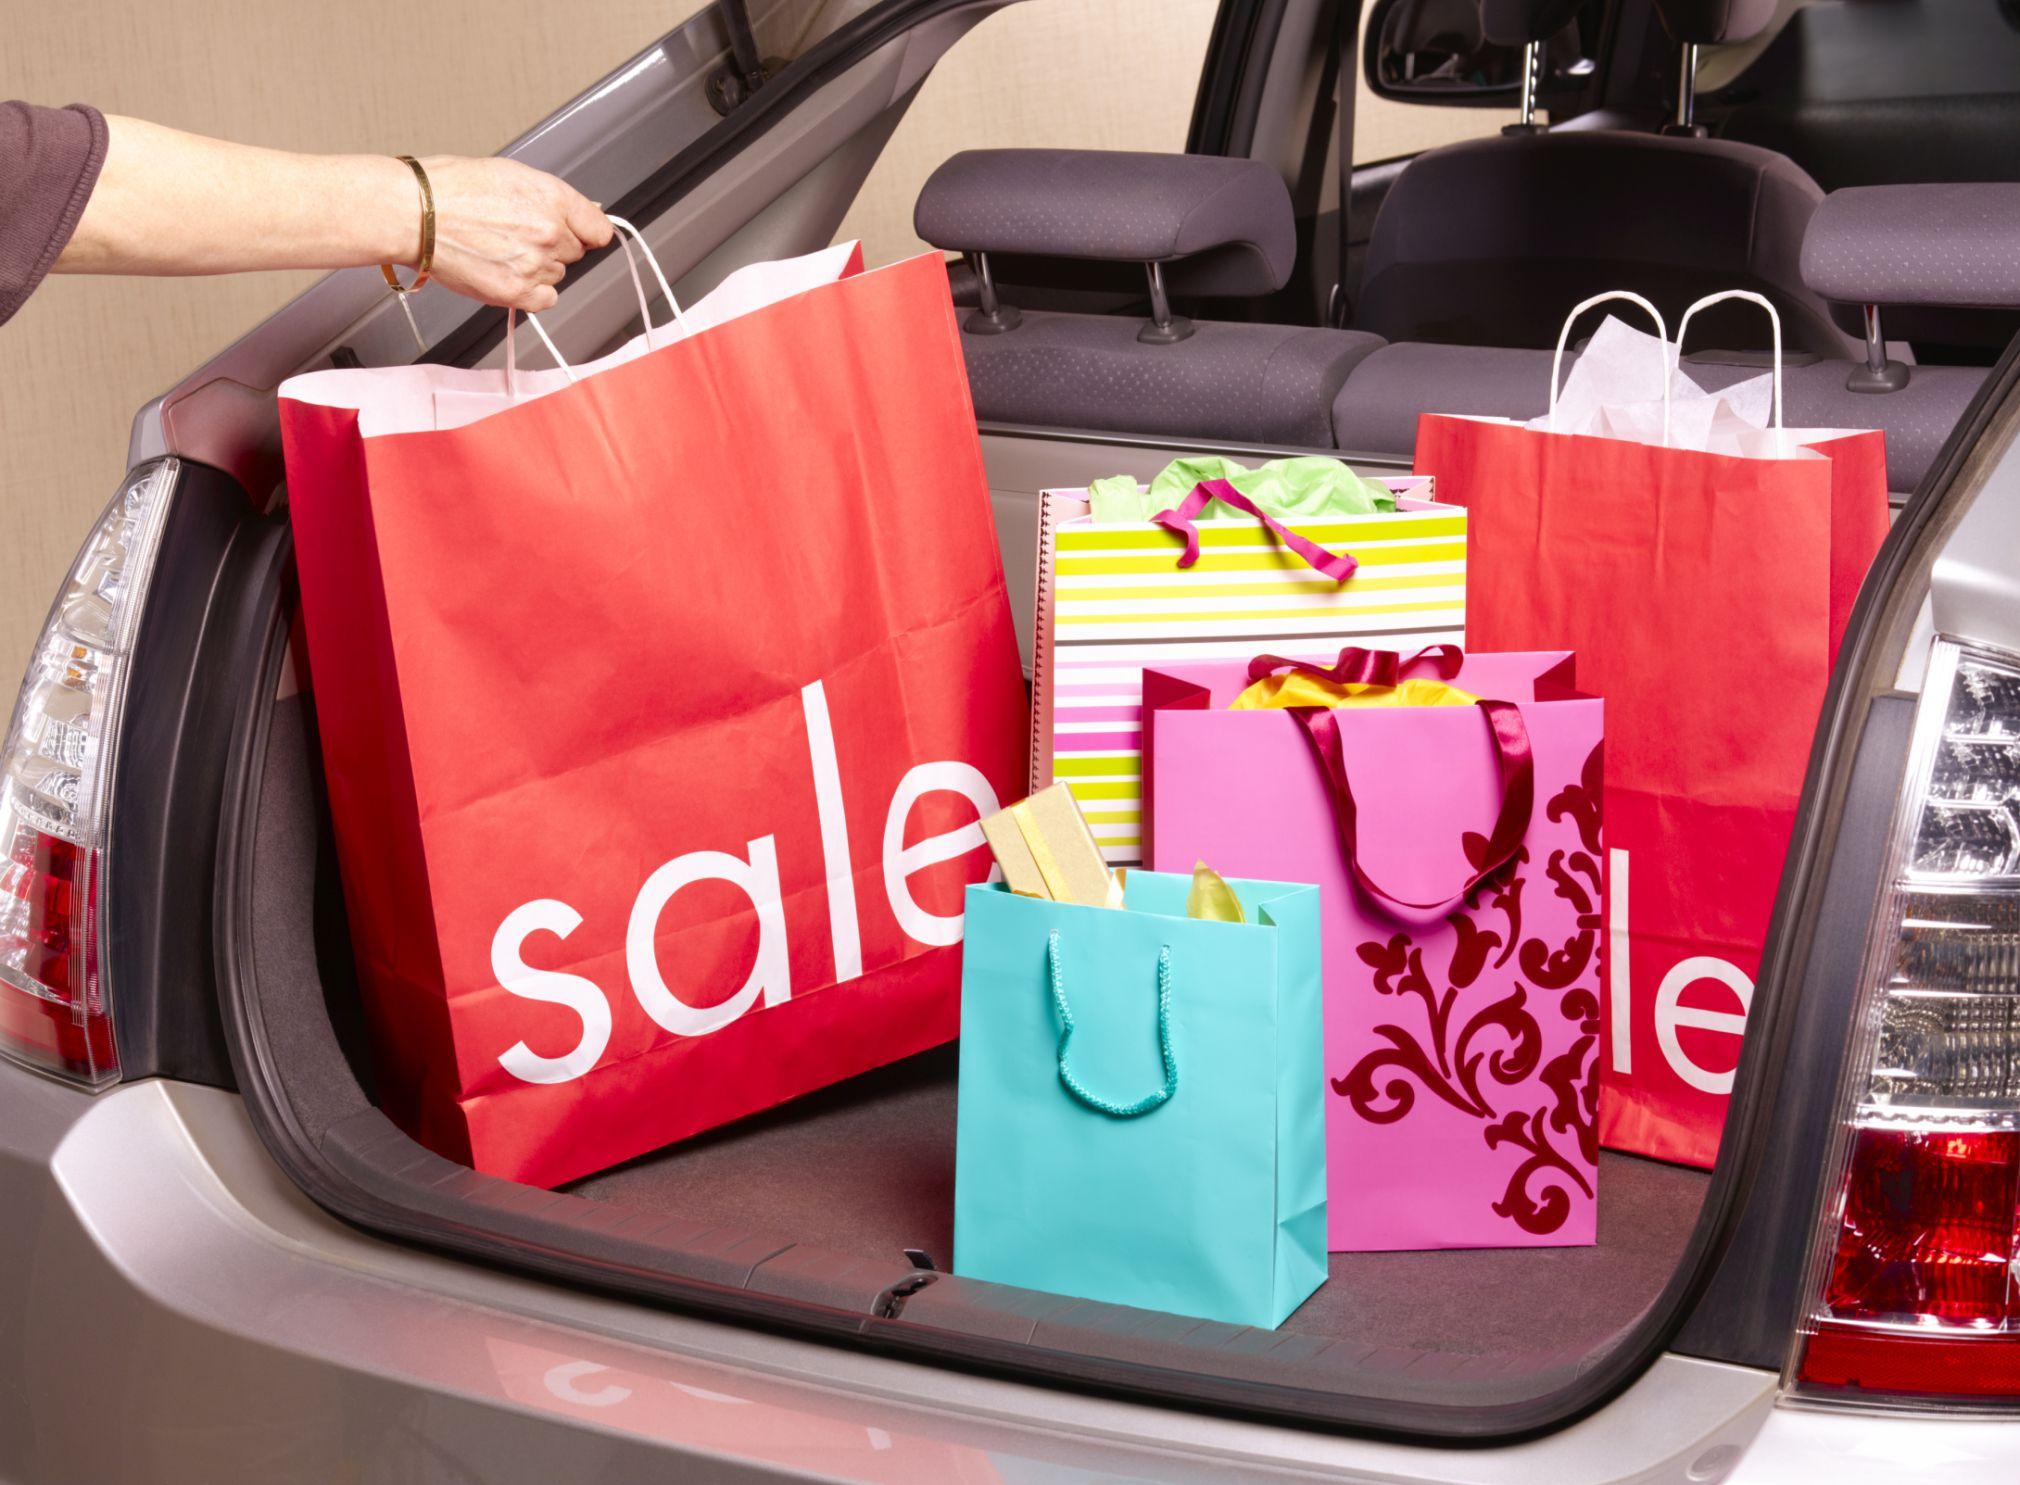 Retail Value Of Car >> A Bargain Shopper's Comprehensive Guide to Seasonal Sales